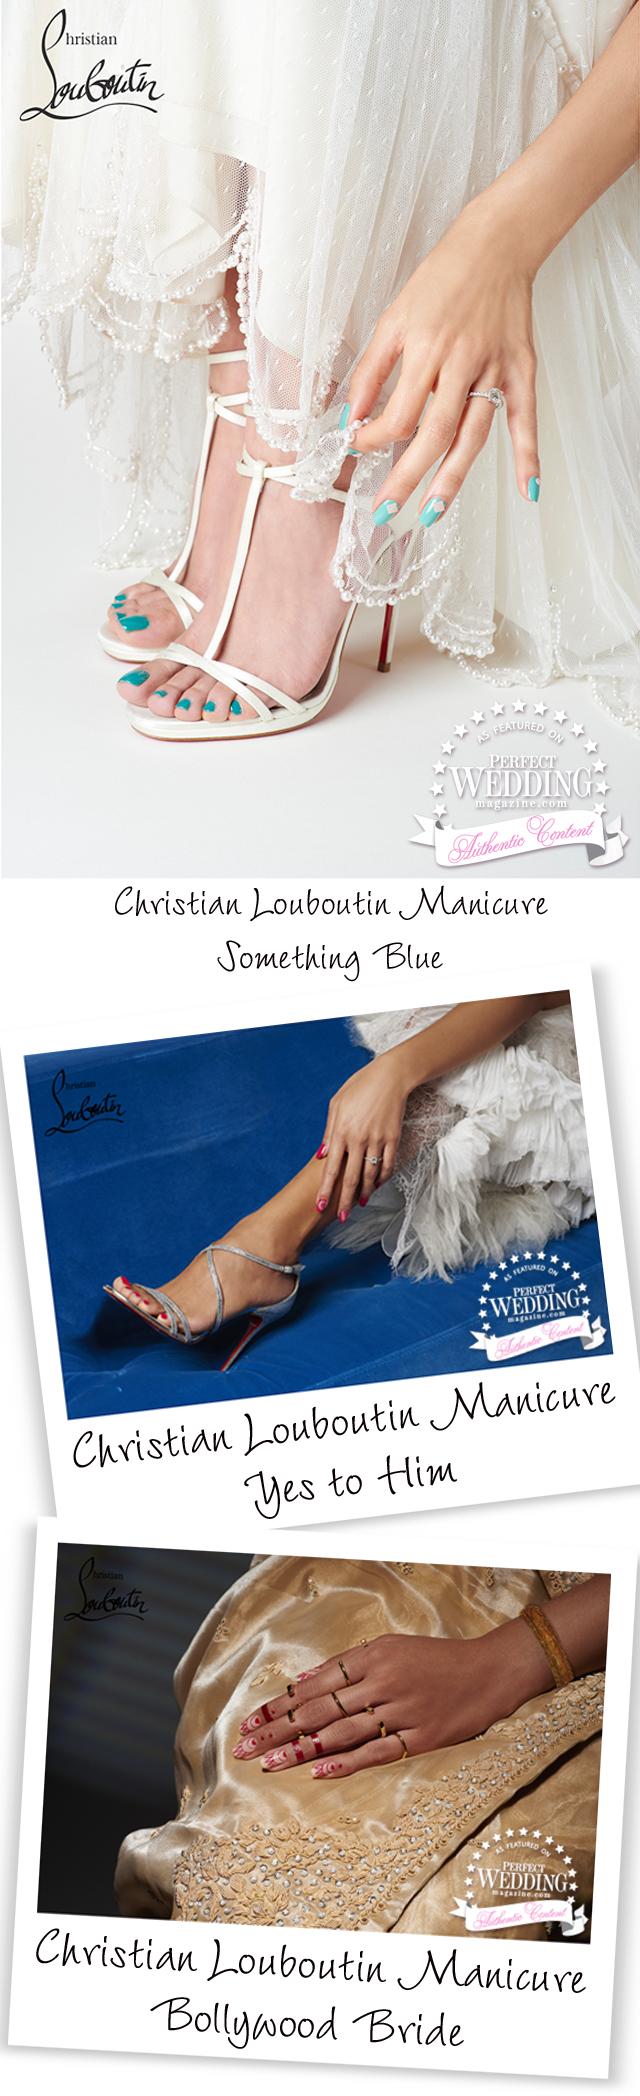 Christian Louboutin, Christian Louboutin Manicure, Christian Louboutin Bridal Manicure, Perfect Wedding Magazine, Nails Bridal trends, Couture Nail